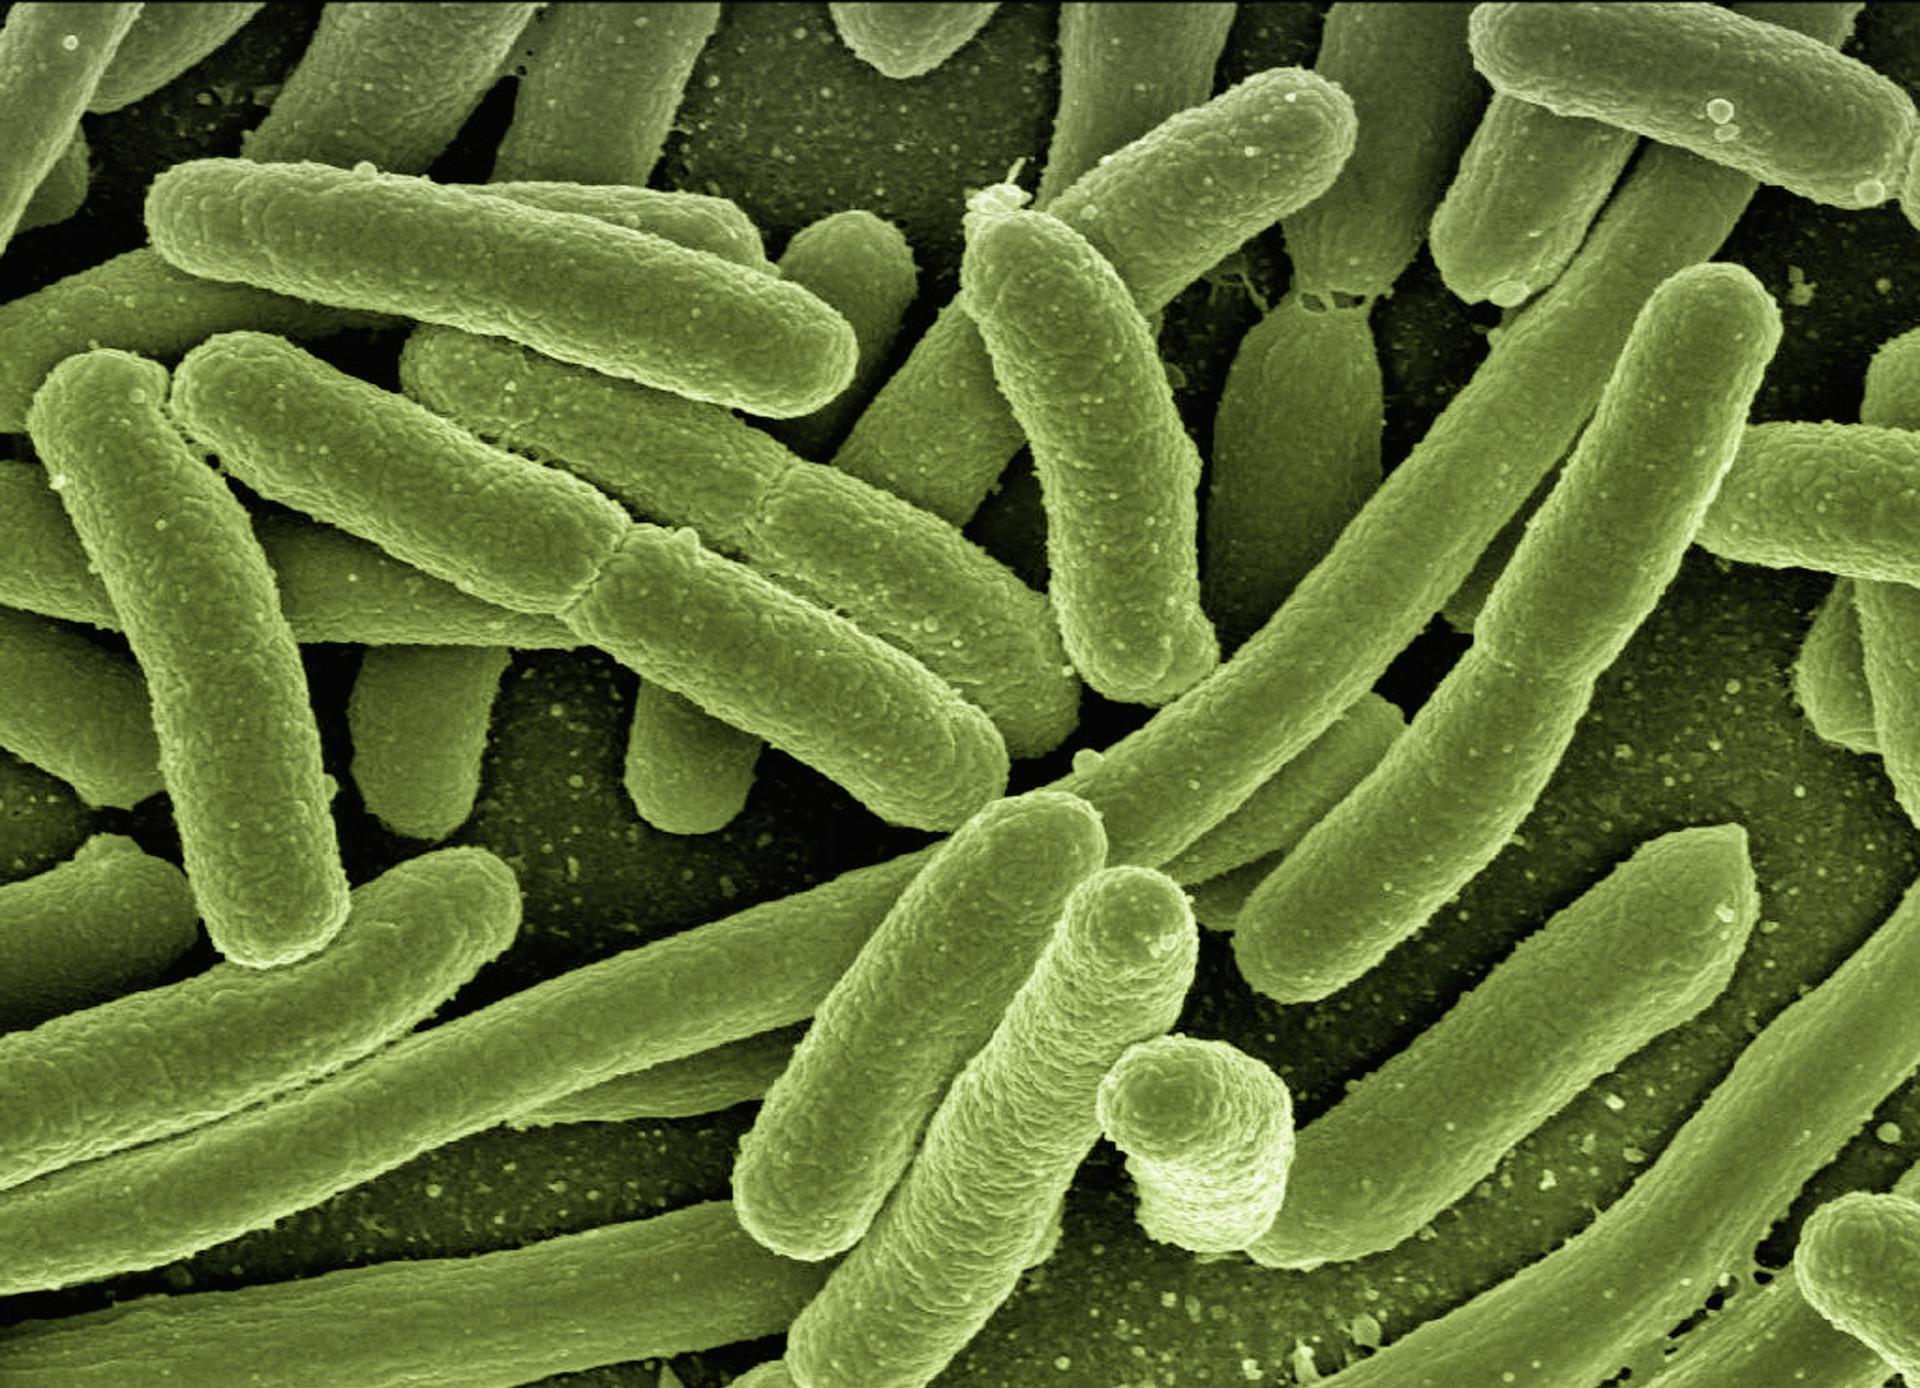 bacterias-intestinales-koli-bacteria